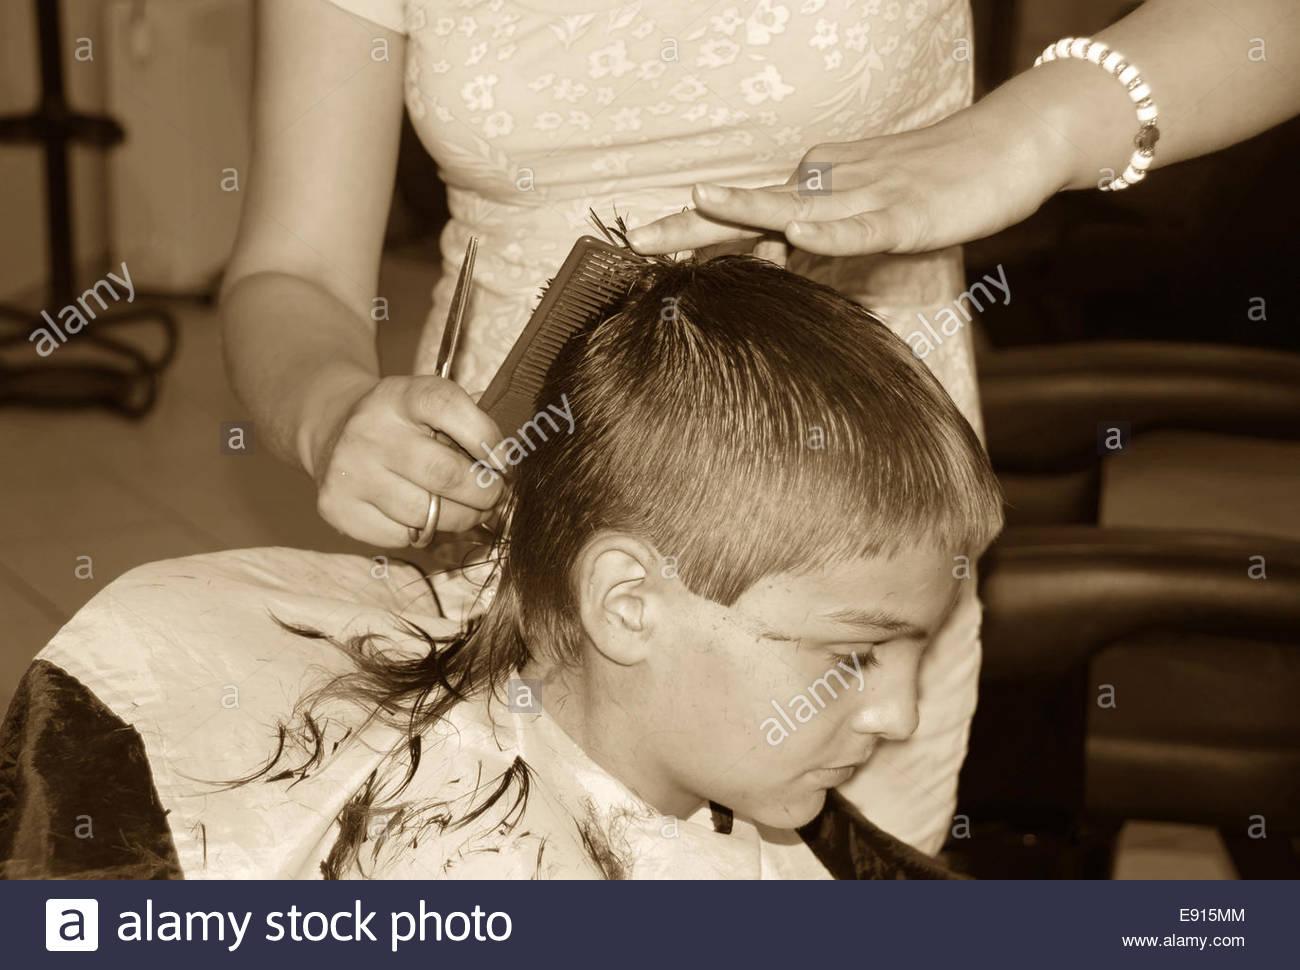 Boy  haircut - Stock Image